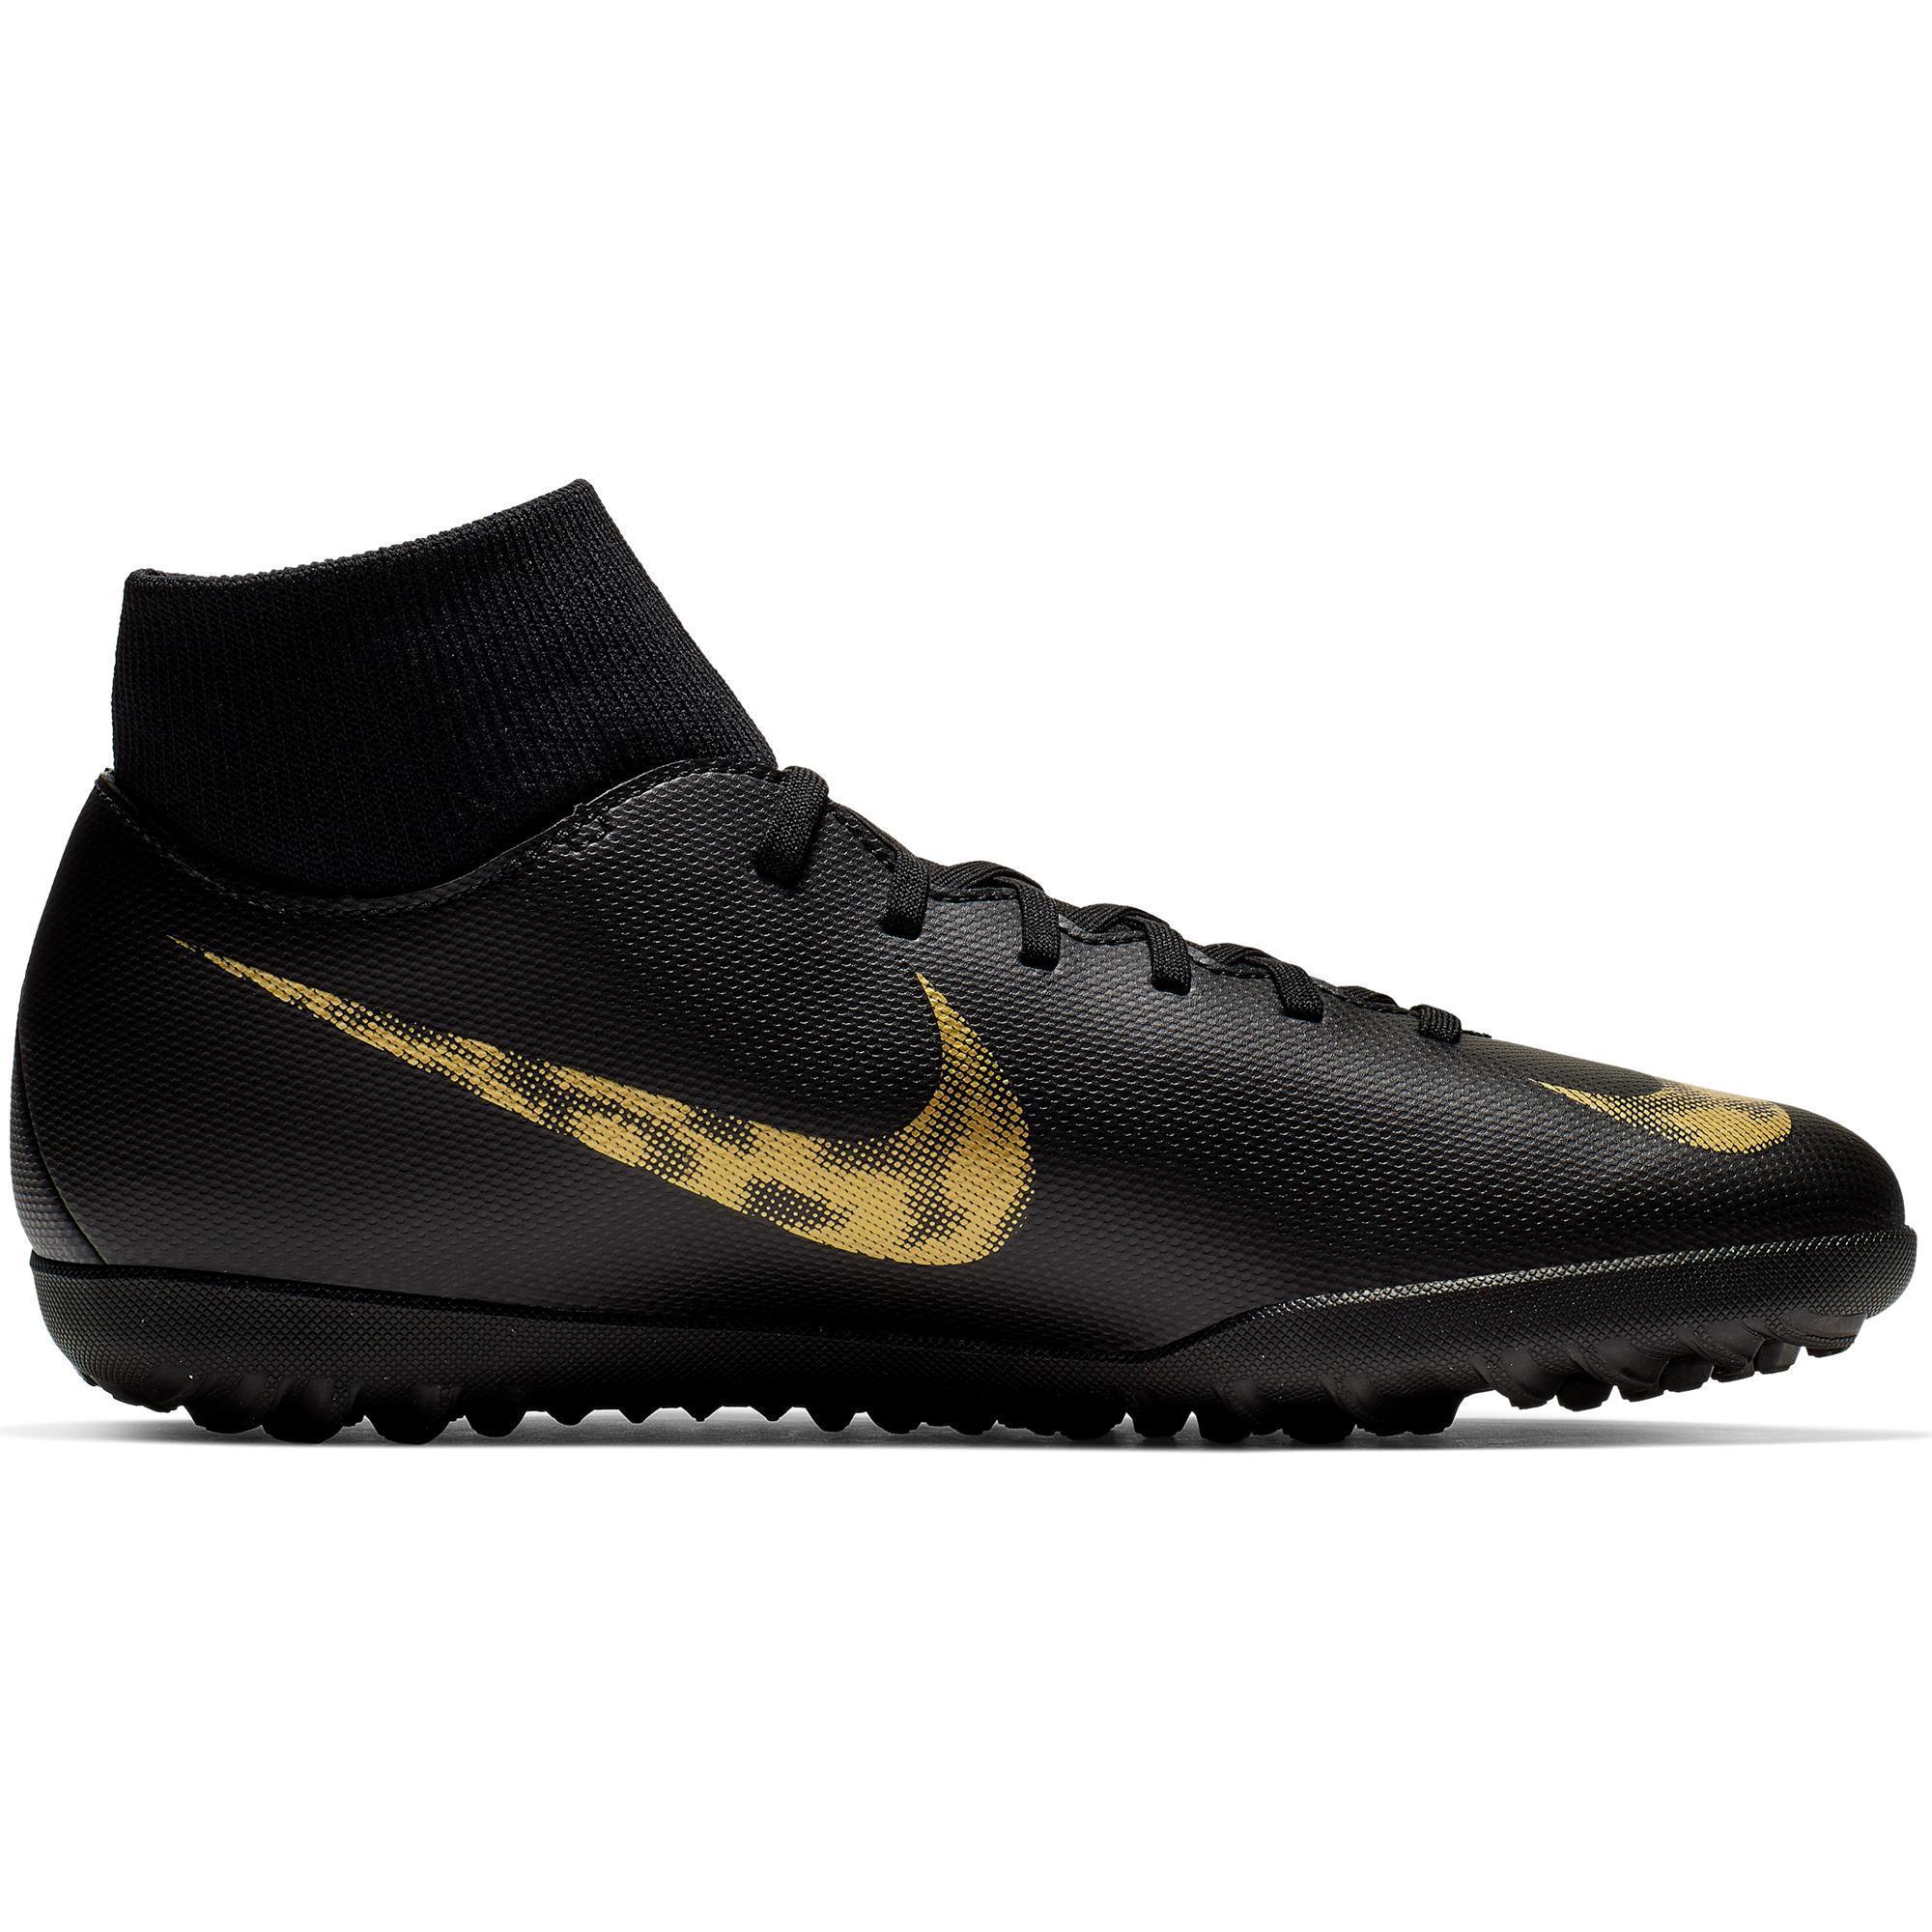 Nike Voetbalschoenen Mercurial Superfly 6 Club TF zwart